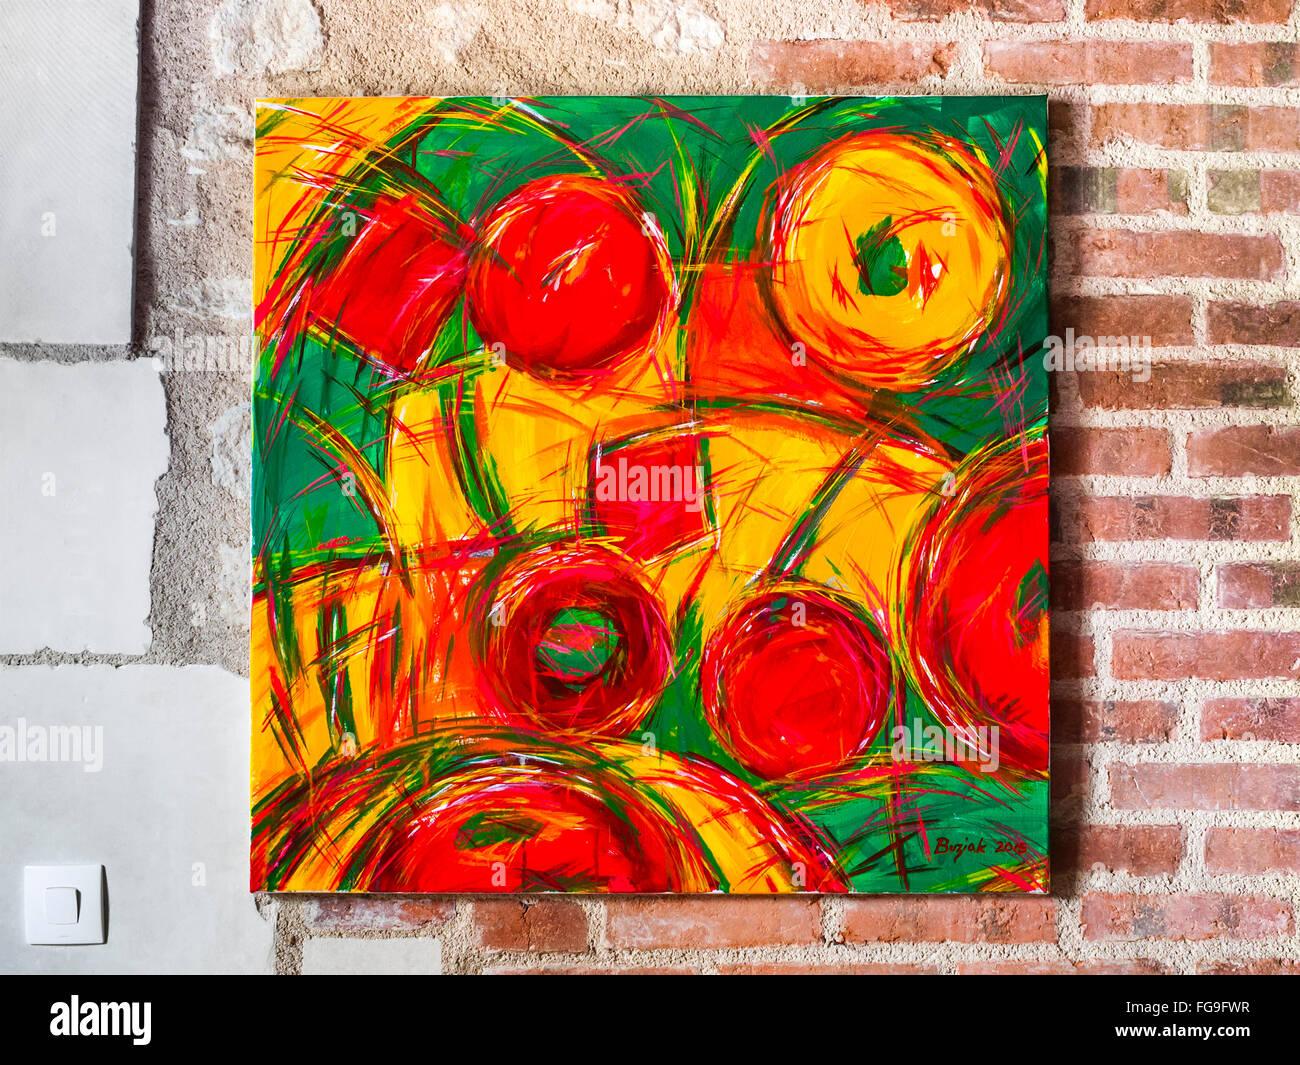 Acrylic painting of fruits / sweets by Ed Buziak. Stock Photo